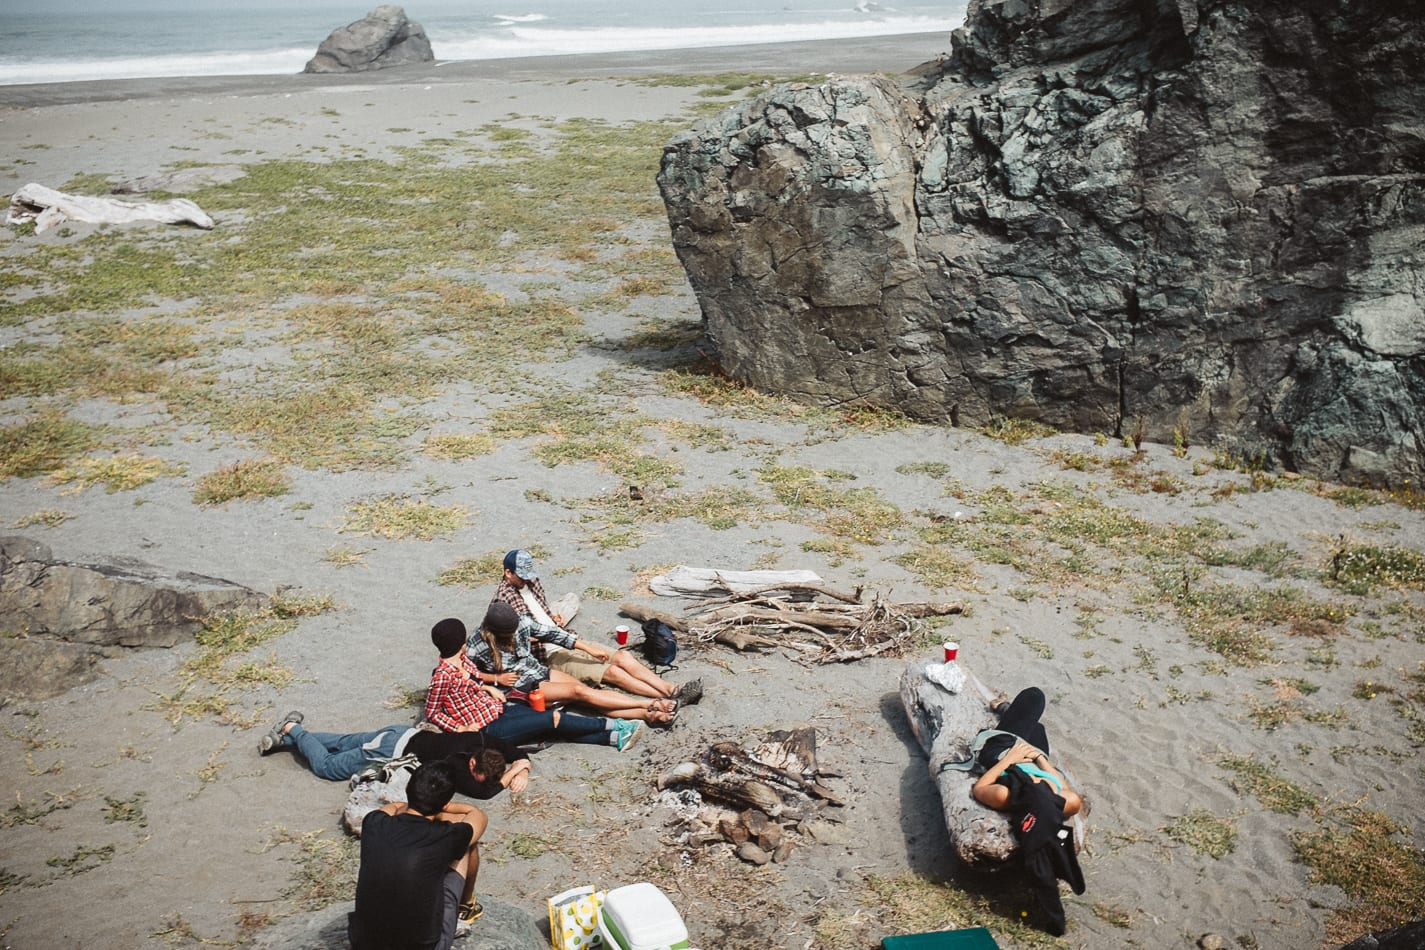 patricks-point-beach-camping-california-adventure-photographer-20